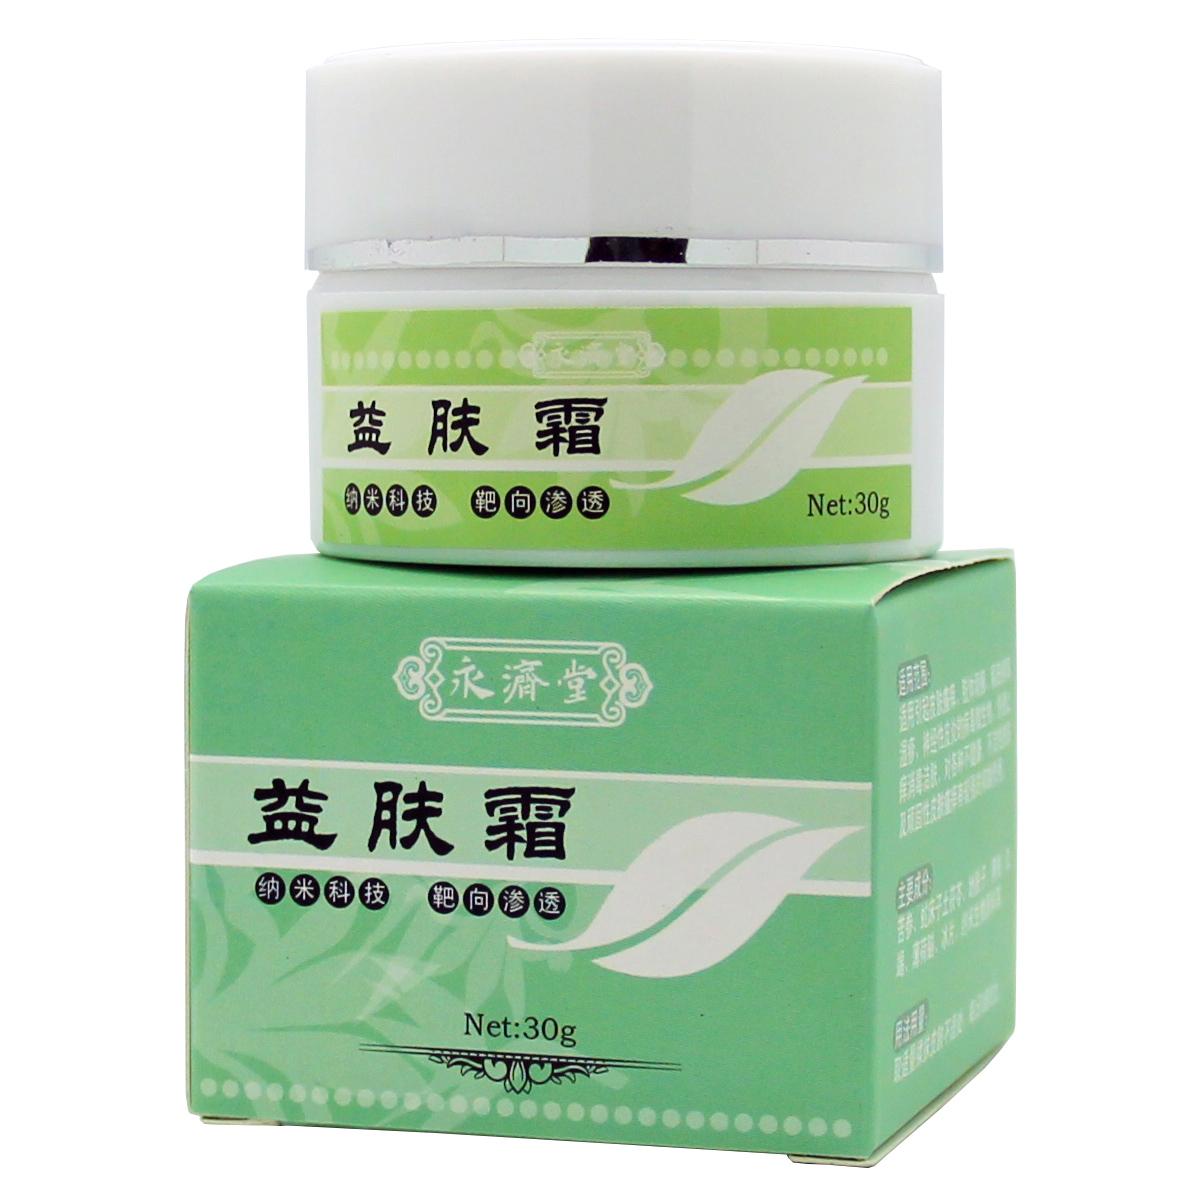 of tinea capitis tinea corporis beneficial skin cream eczema scrotum neurodermatitis tinea versicolor tinea blisters(China (Mainland))